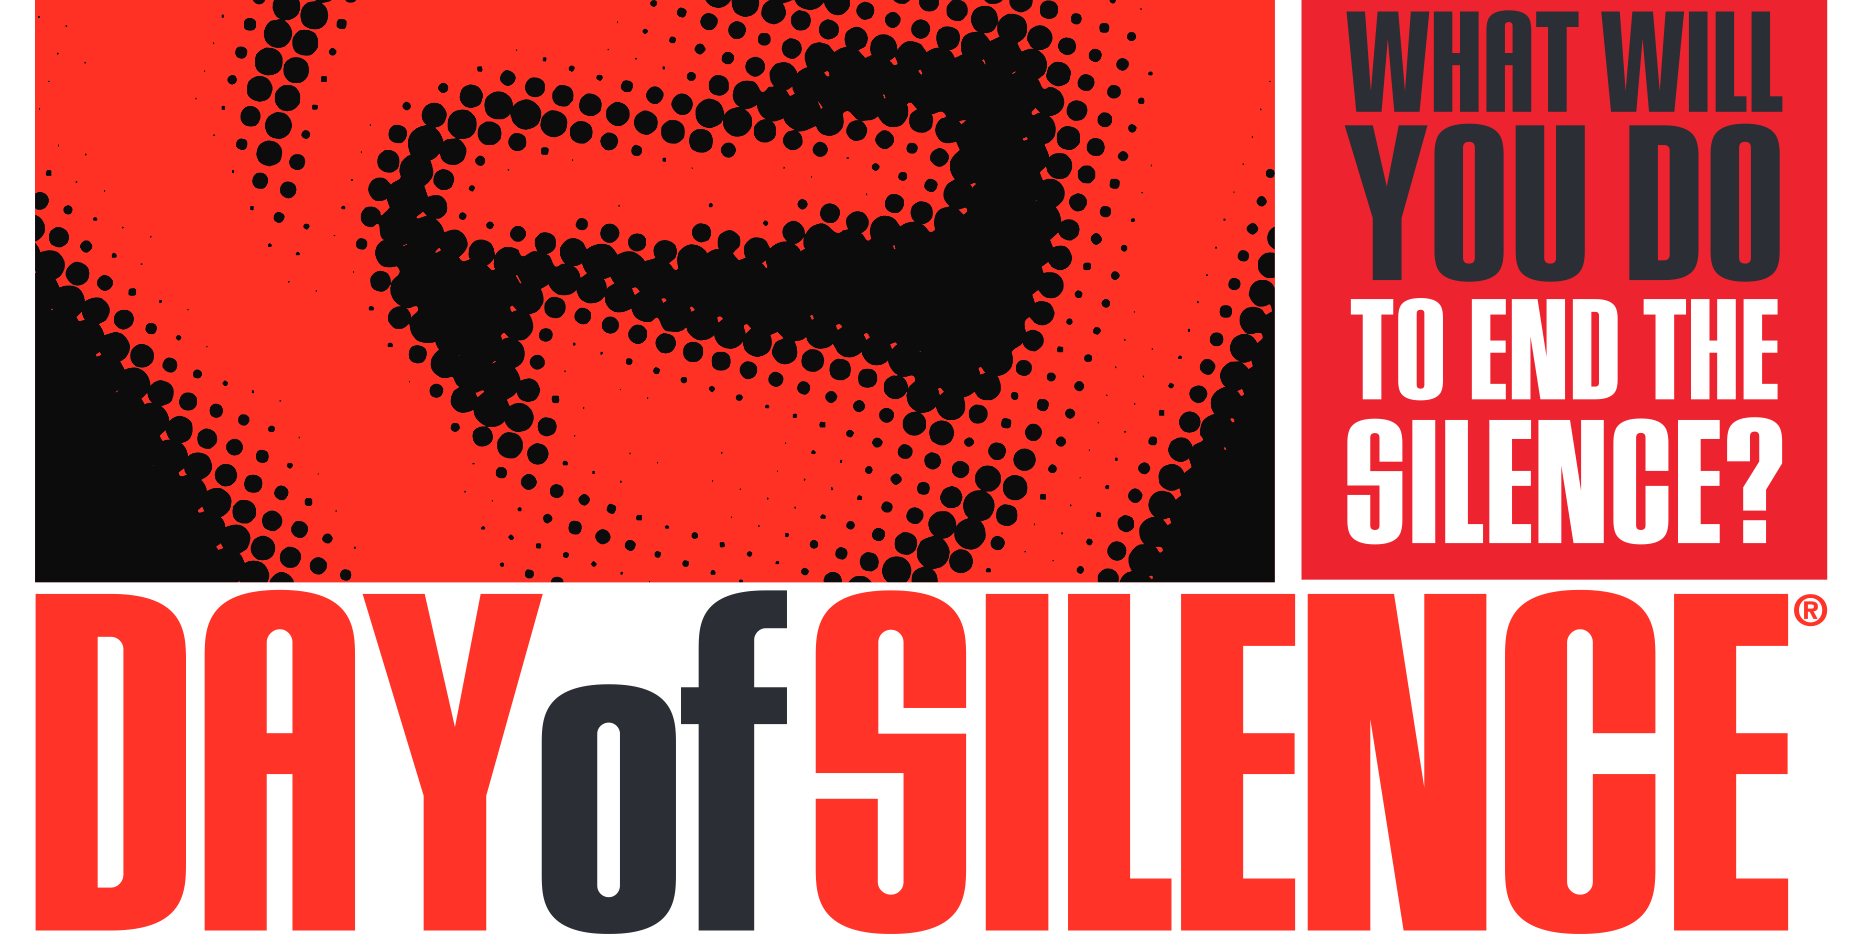 speaking through silence essay